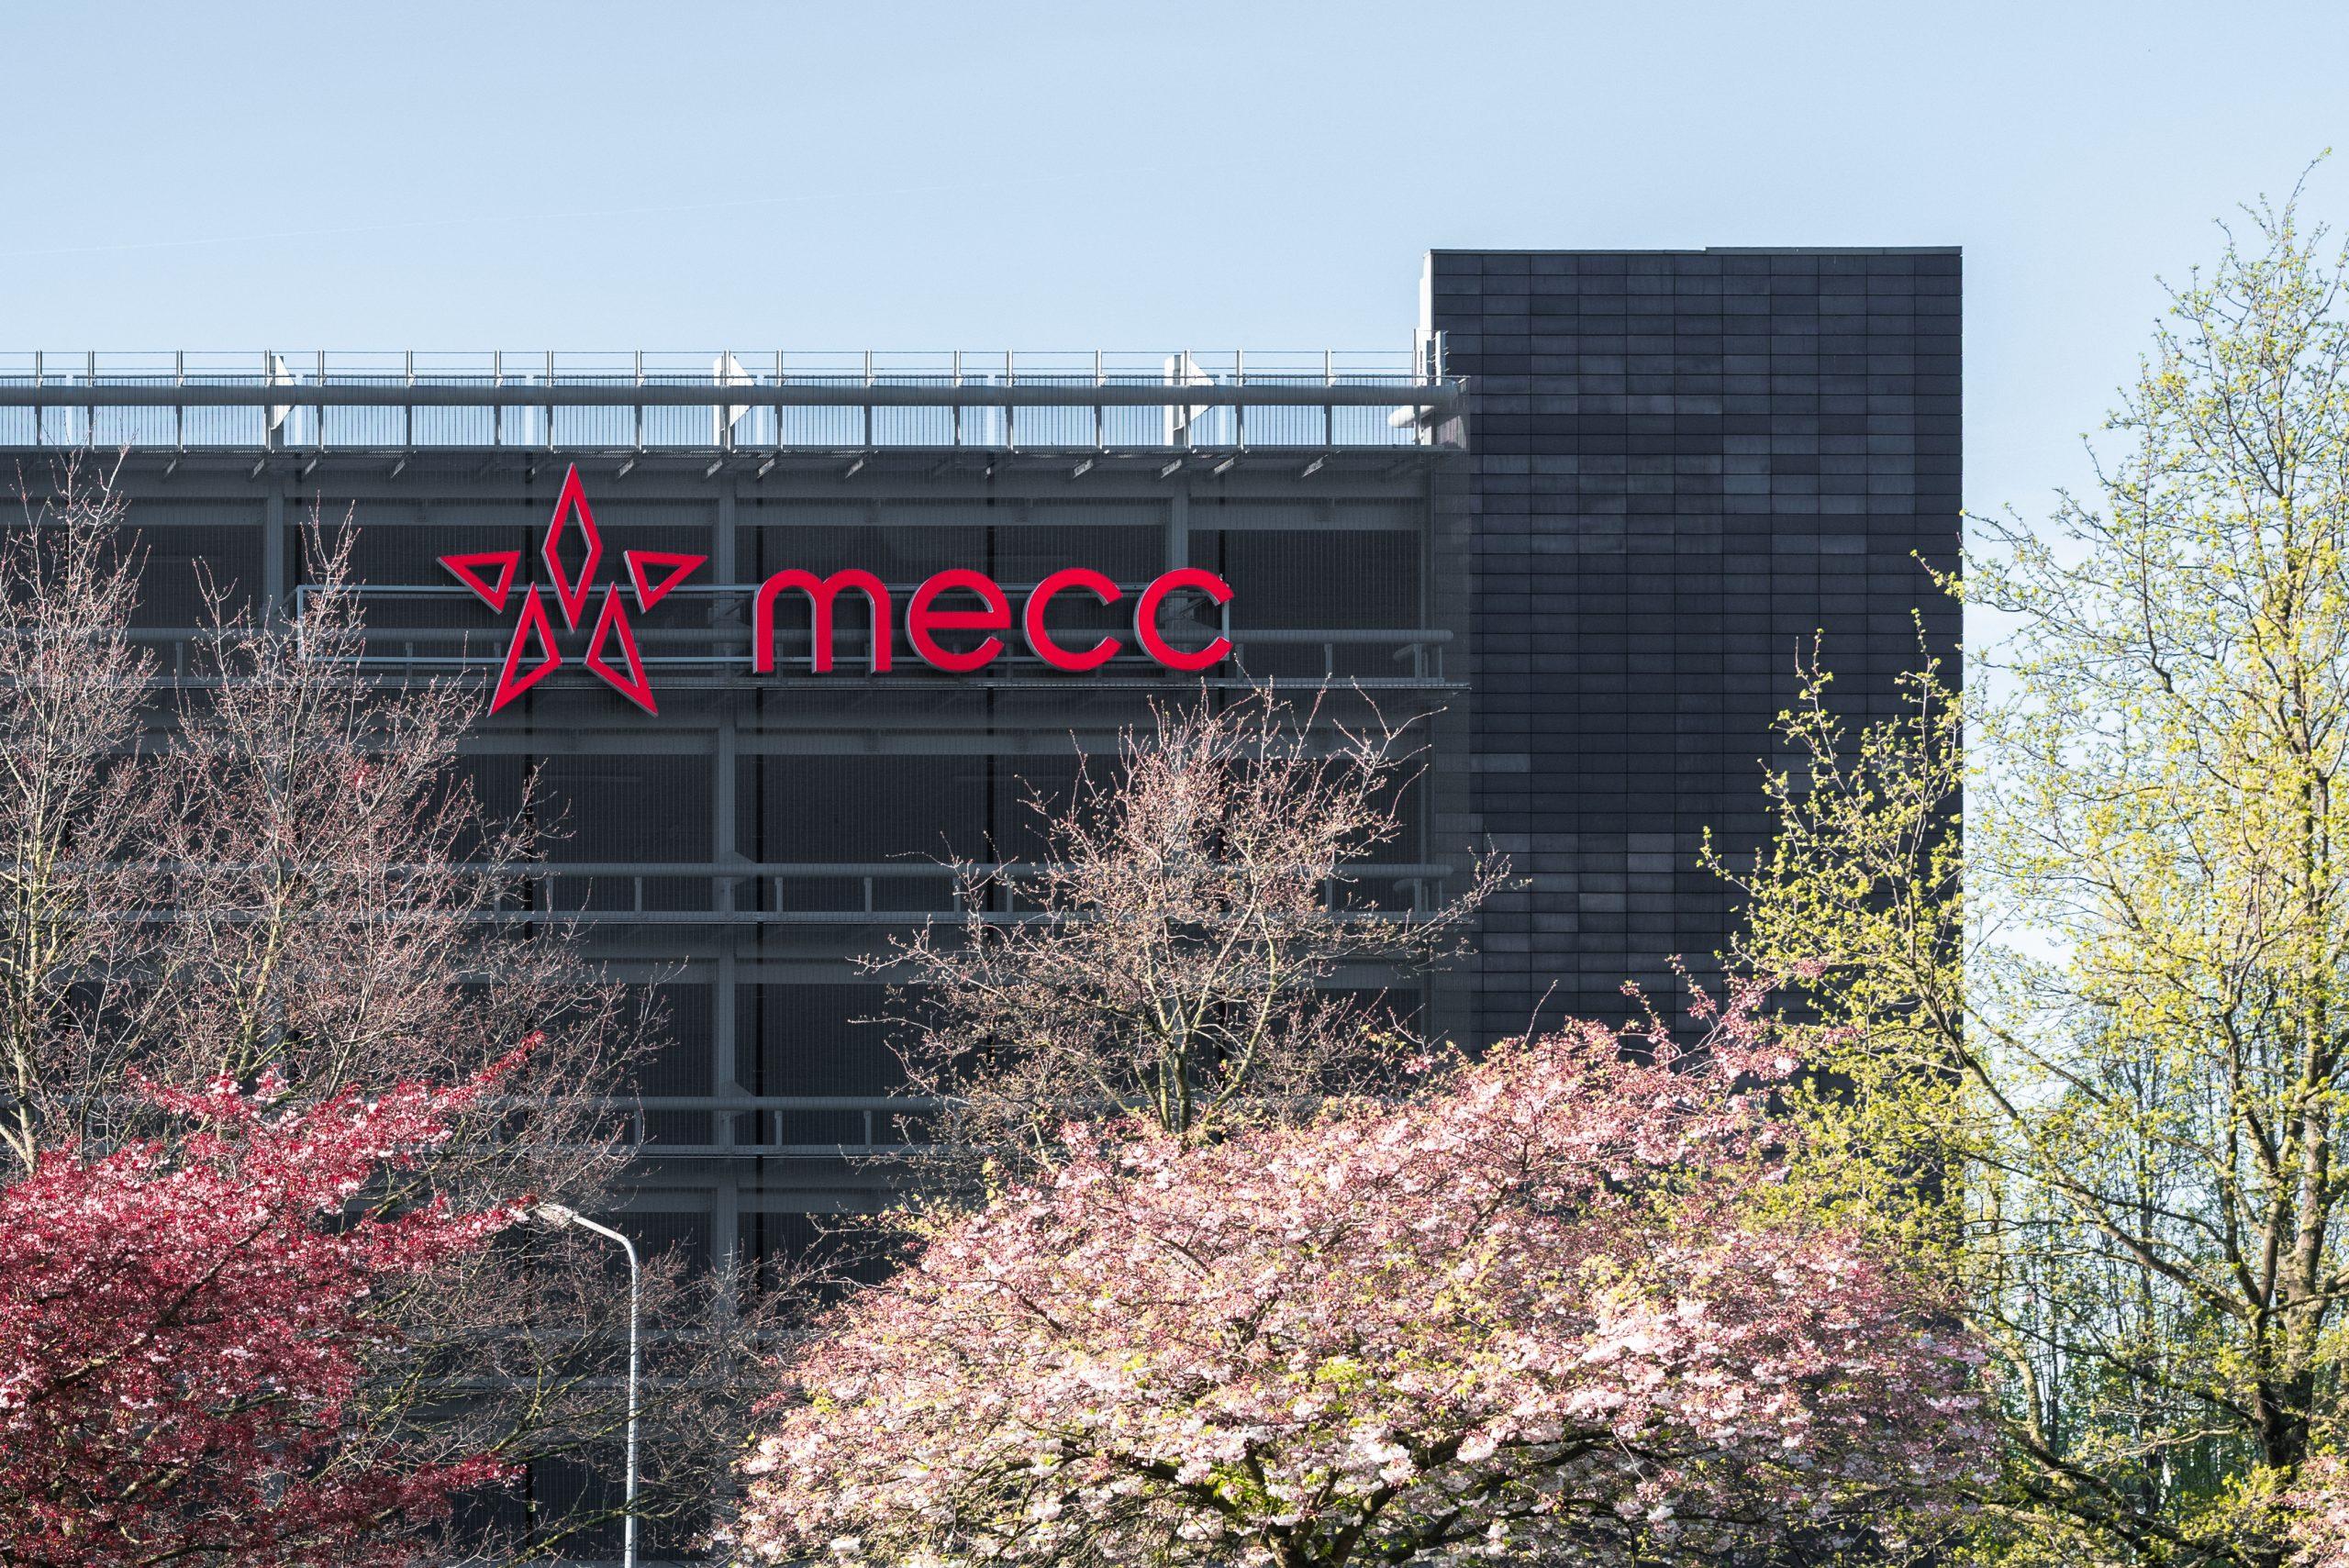 Mecc corporate identity logo